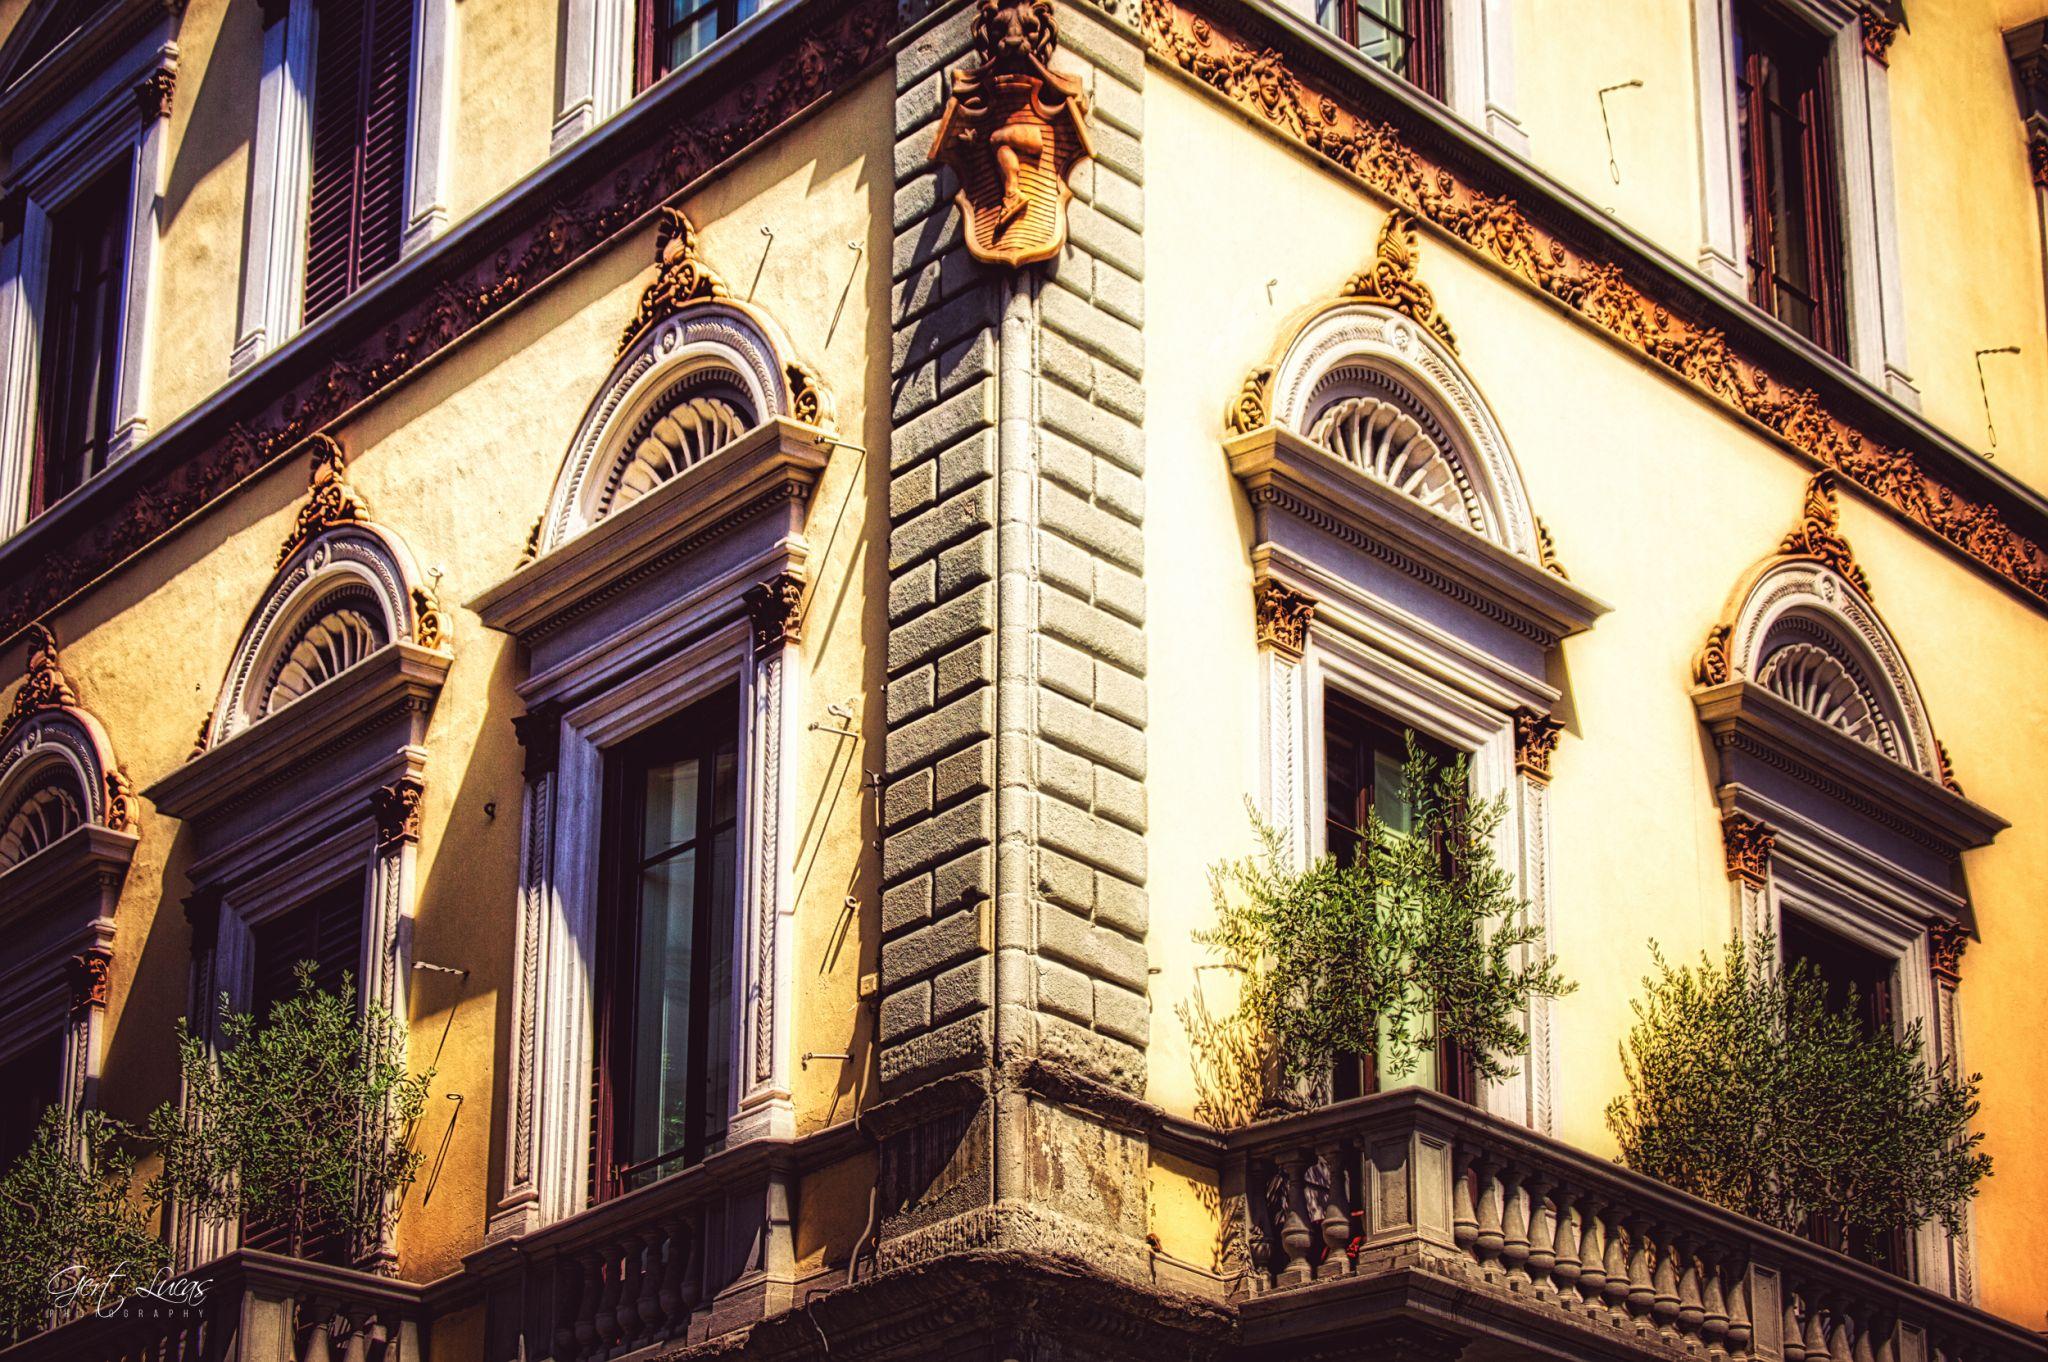 Firenze - townfacade, Italy